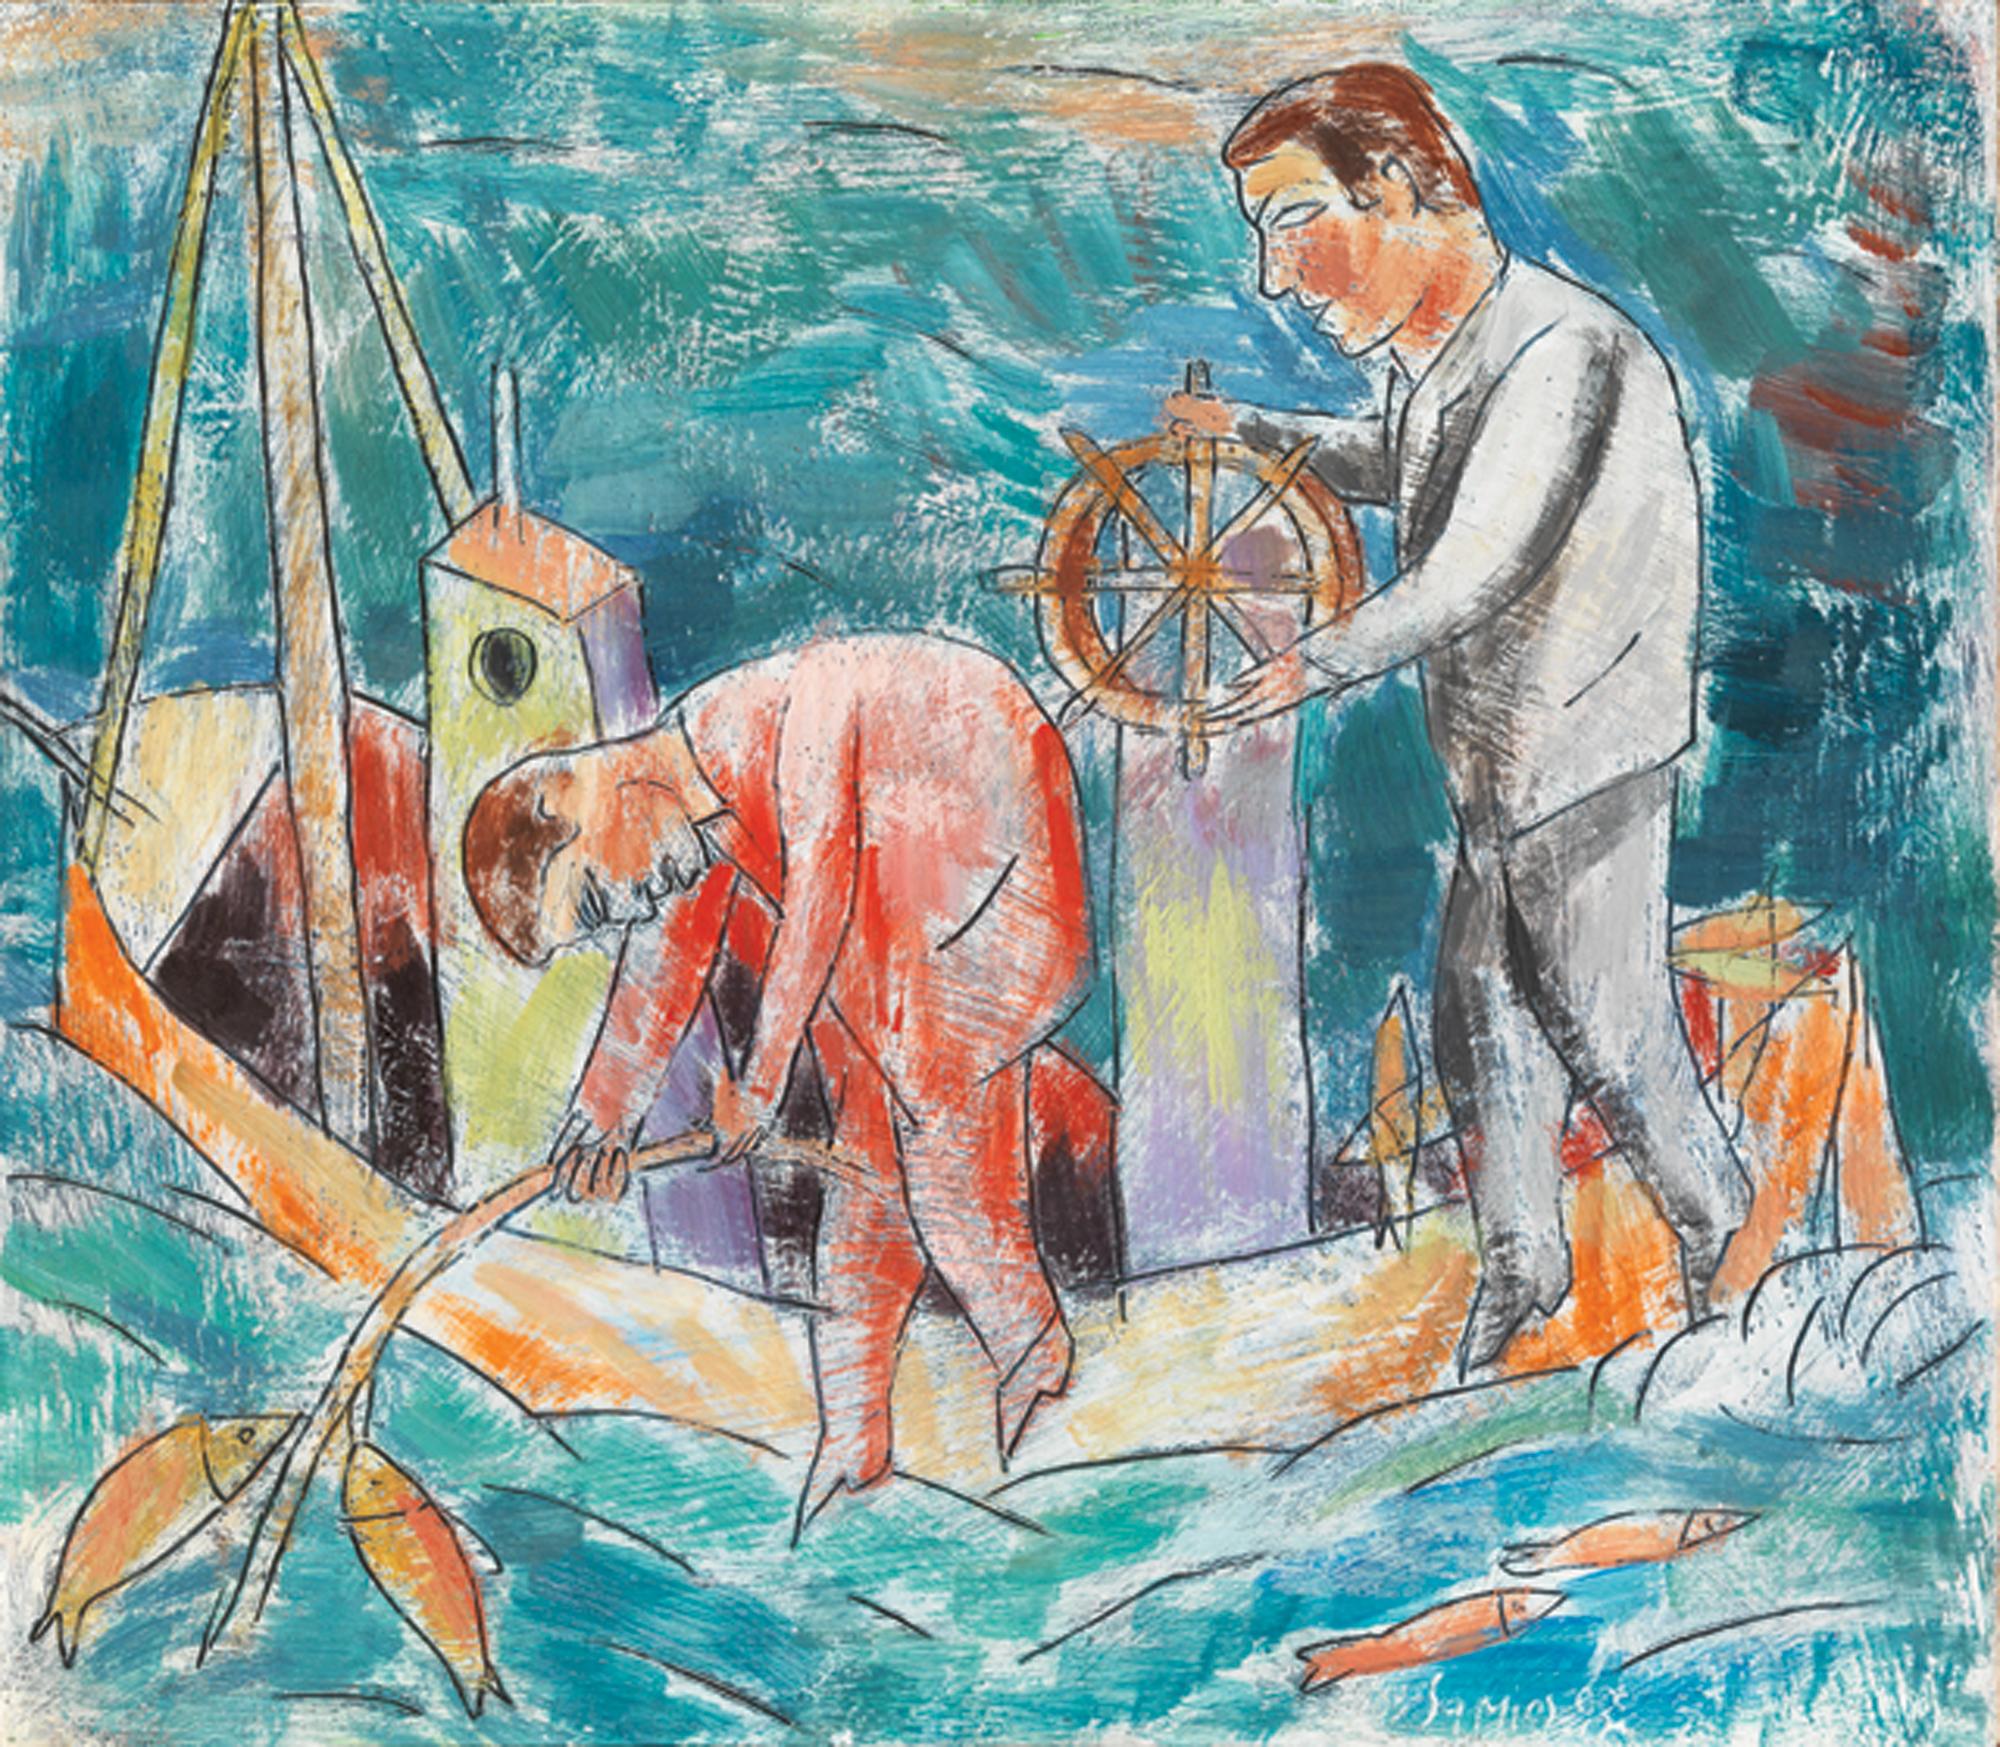 Pavlos Samios - Fishermen in a boat